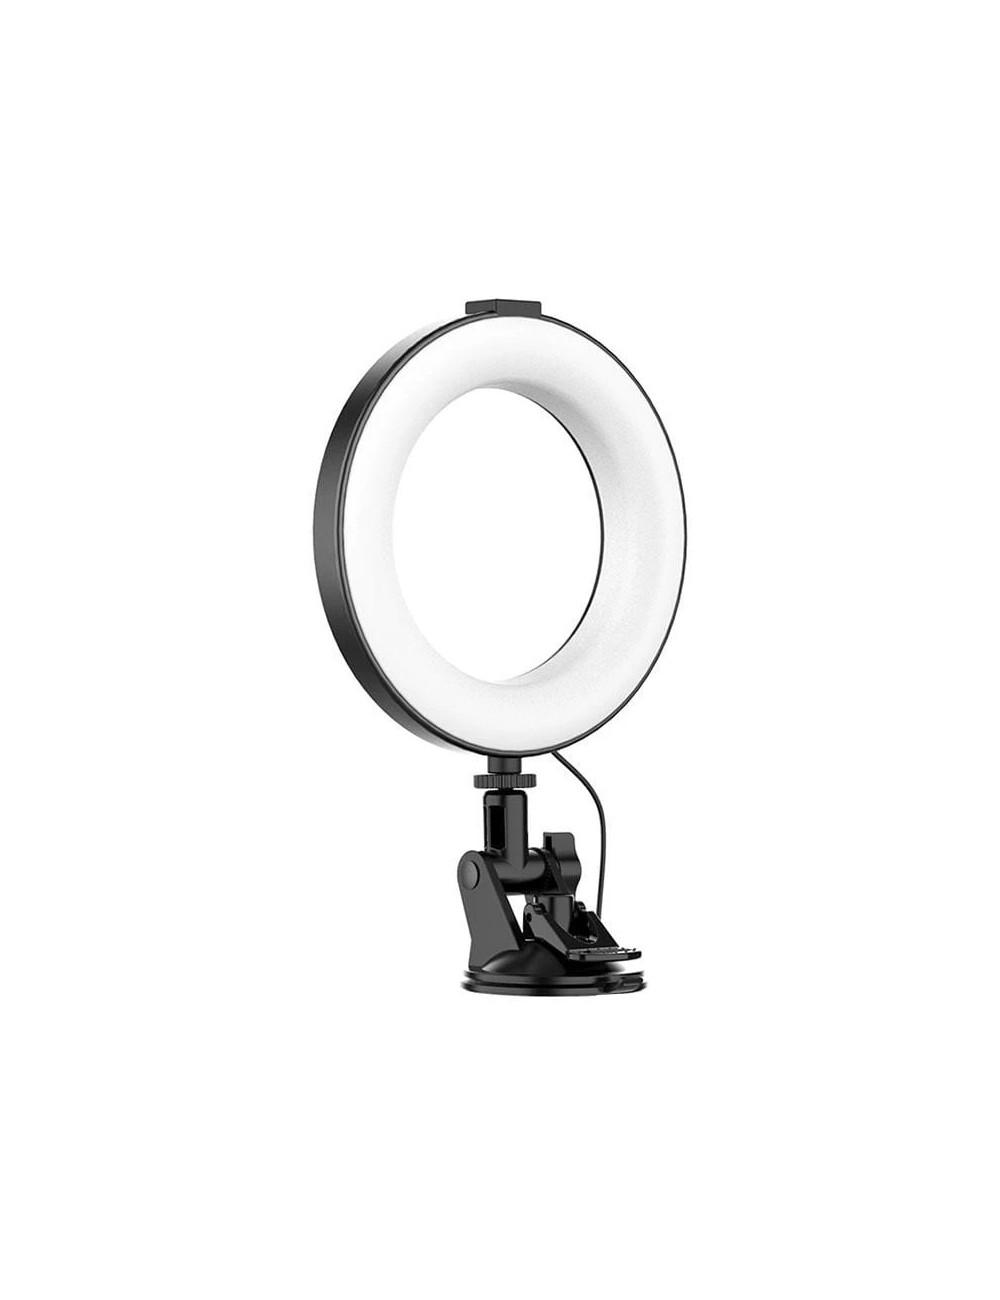 KIT - Soporte Reflector Con Tripode Grande